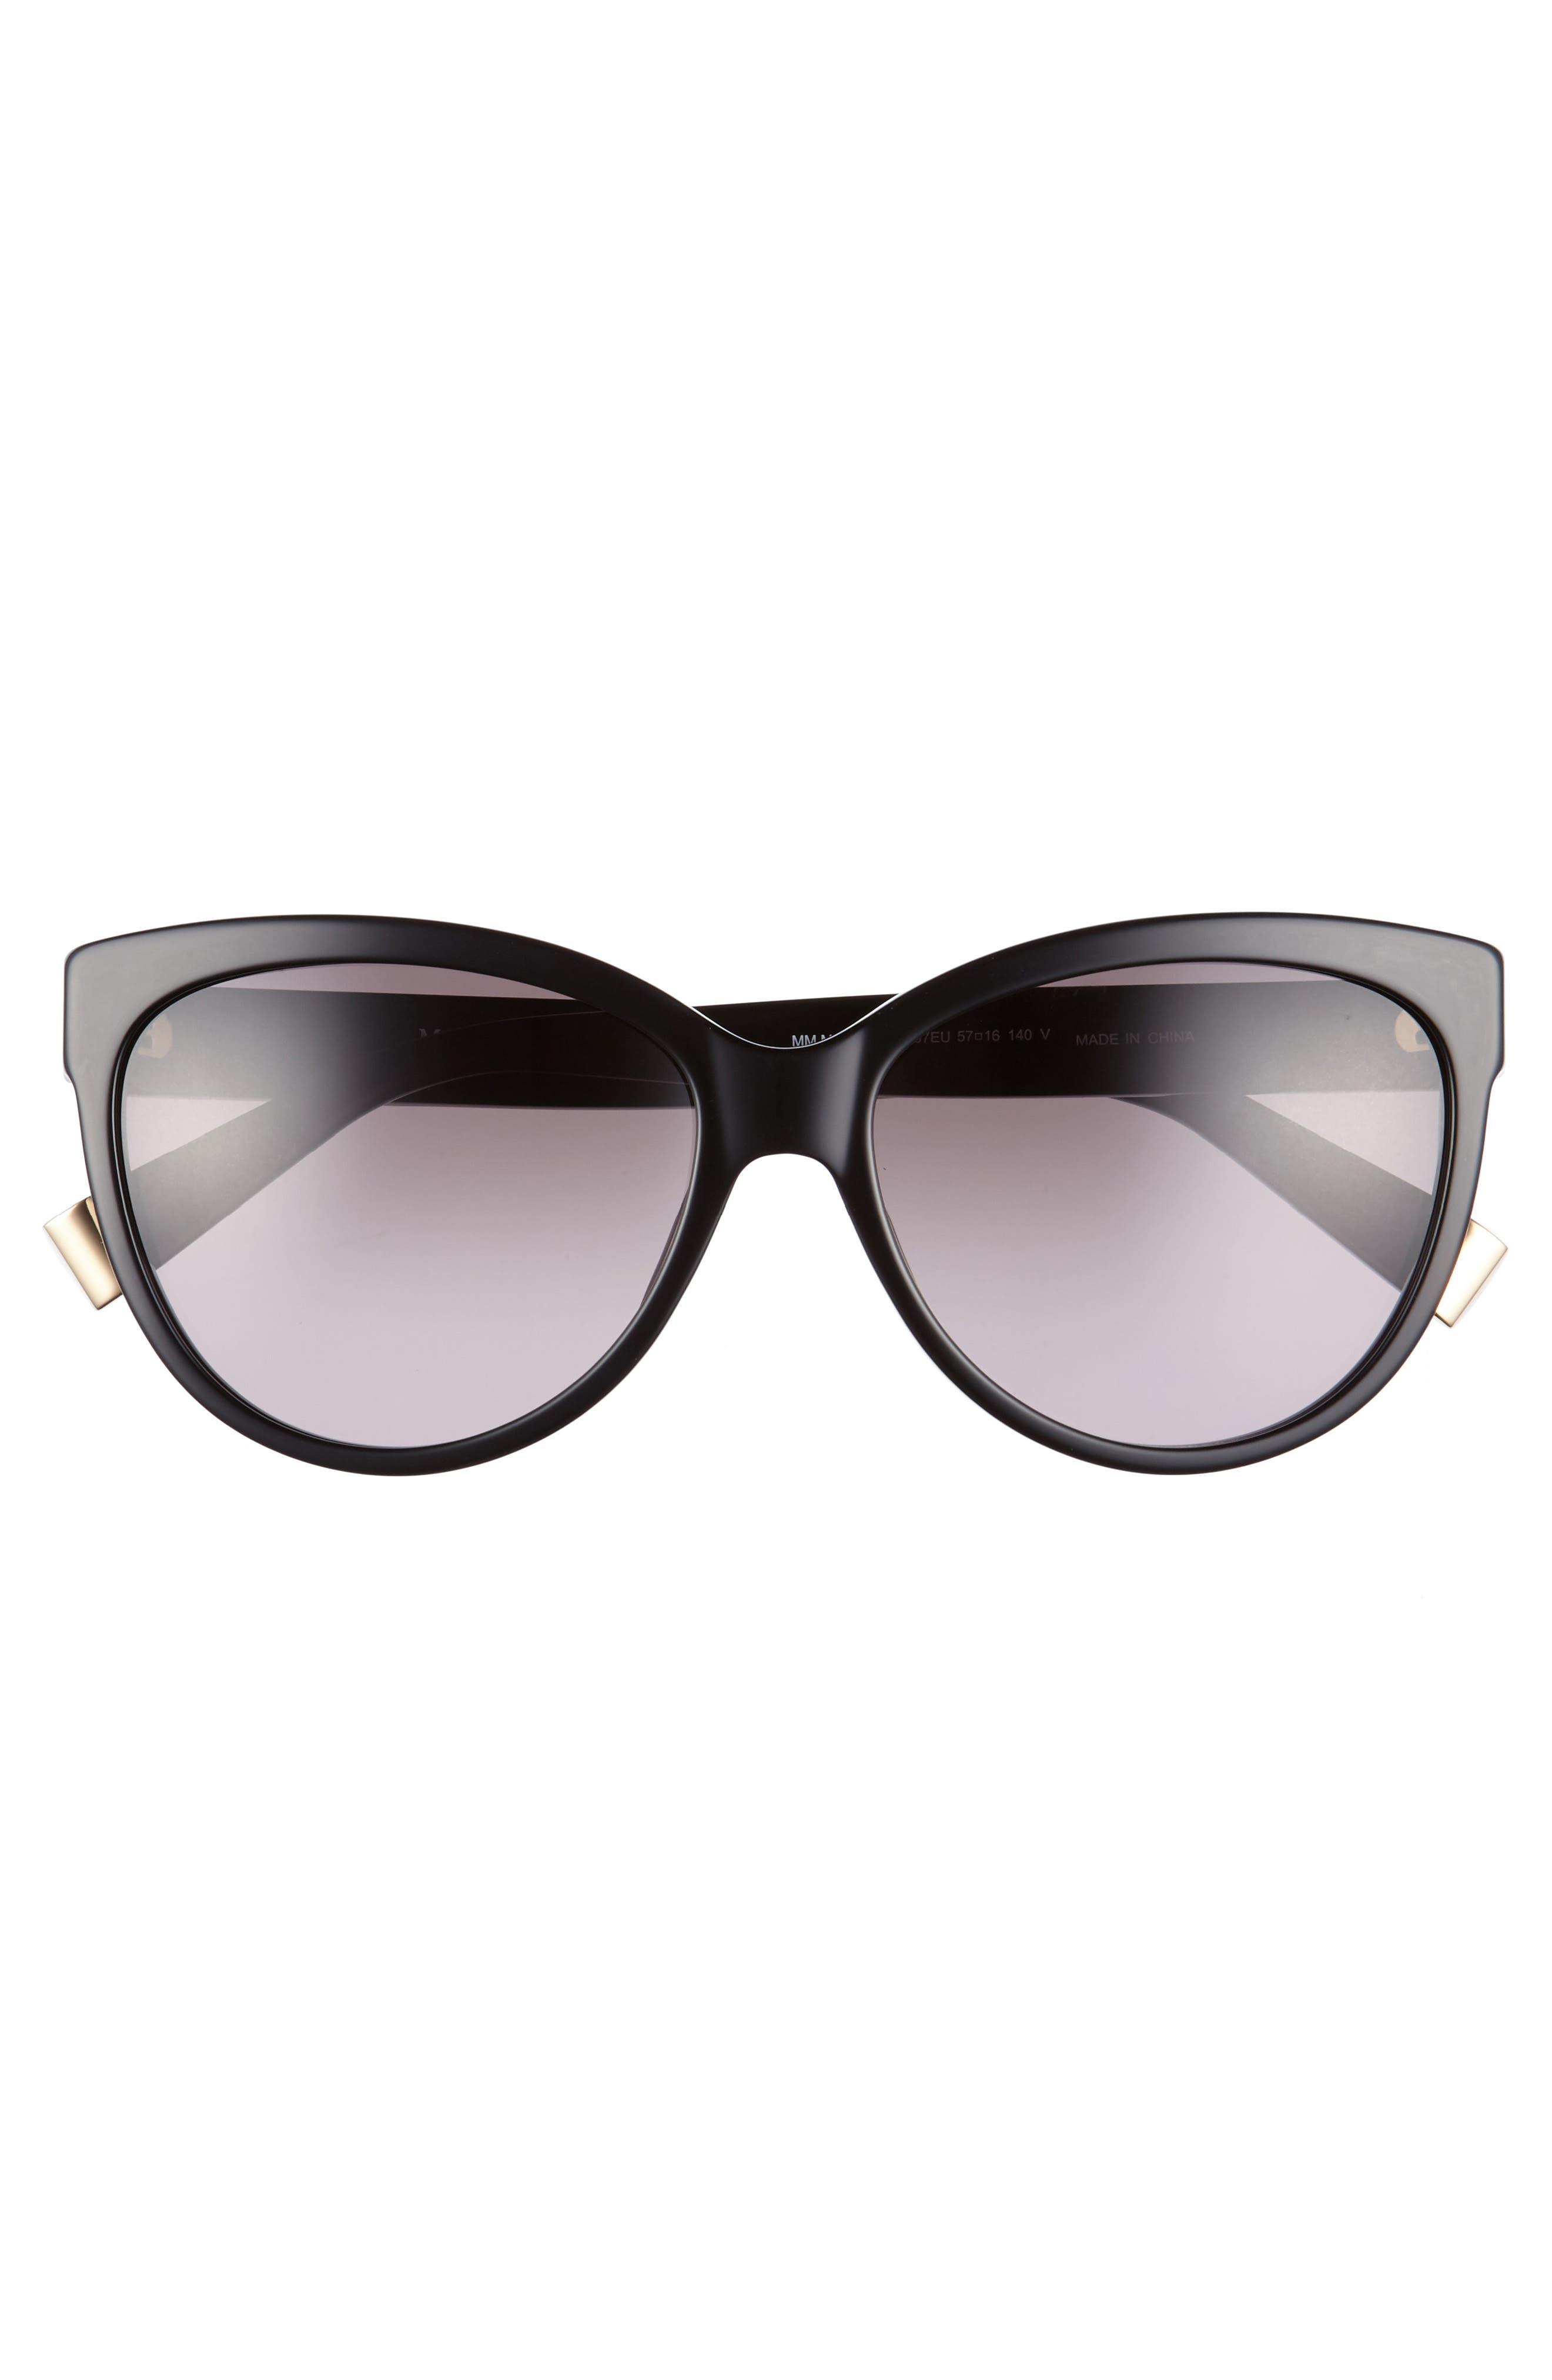 Moderii 57mm Gradient Cat Eye Sunglasses,                             Alternate thumbnail 3, color,                             001